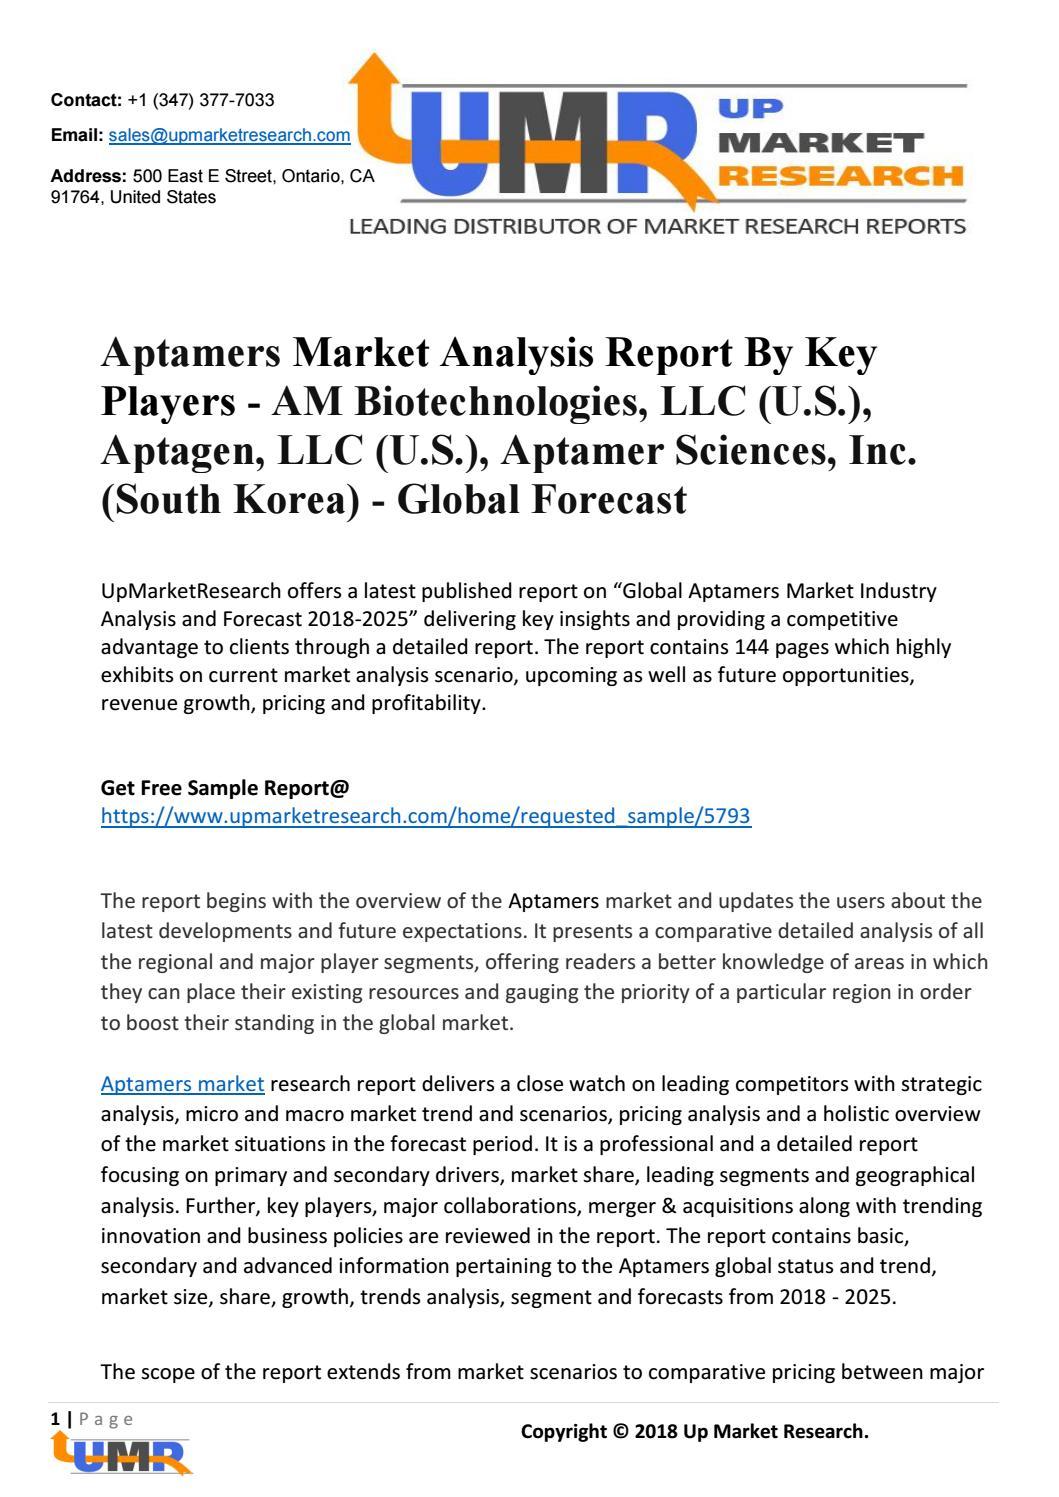 Aptamers Market Analysis Report By Key Players - AM Biotechnologies, LLC  (U S ), Aptagen, LLC (U S )